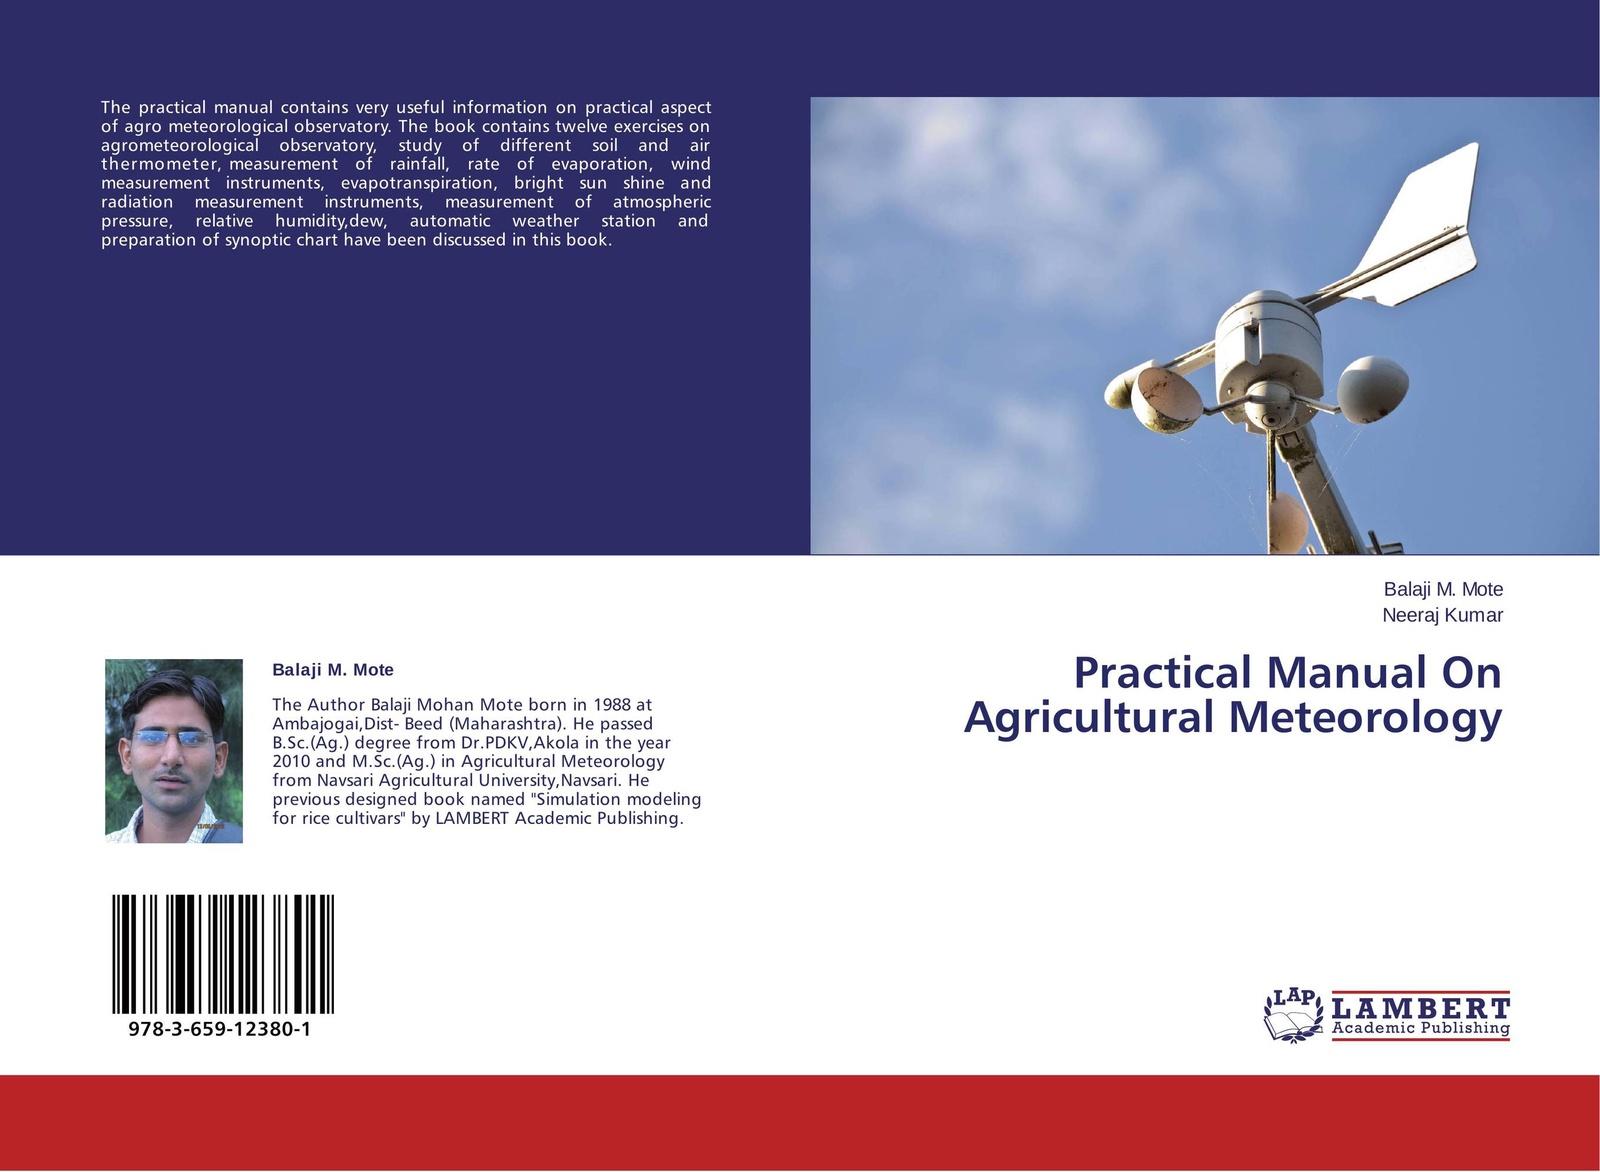 Balaji M. Mote and Neeraj Kumar Practical Manual On Agricultural Meteorology